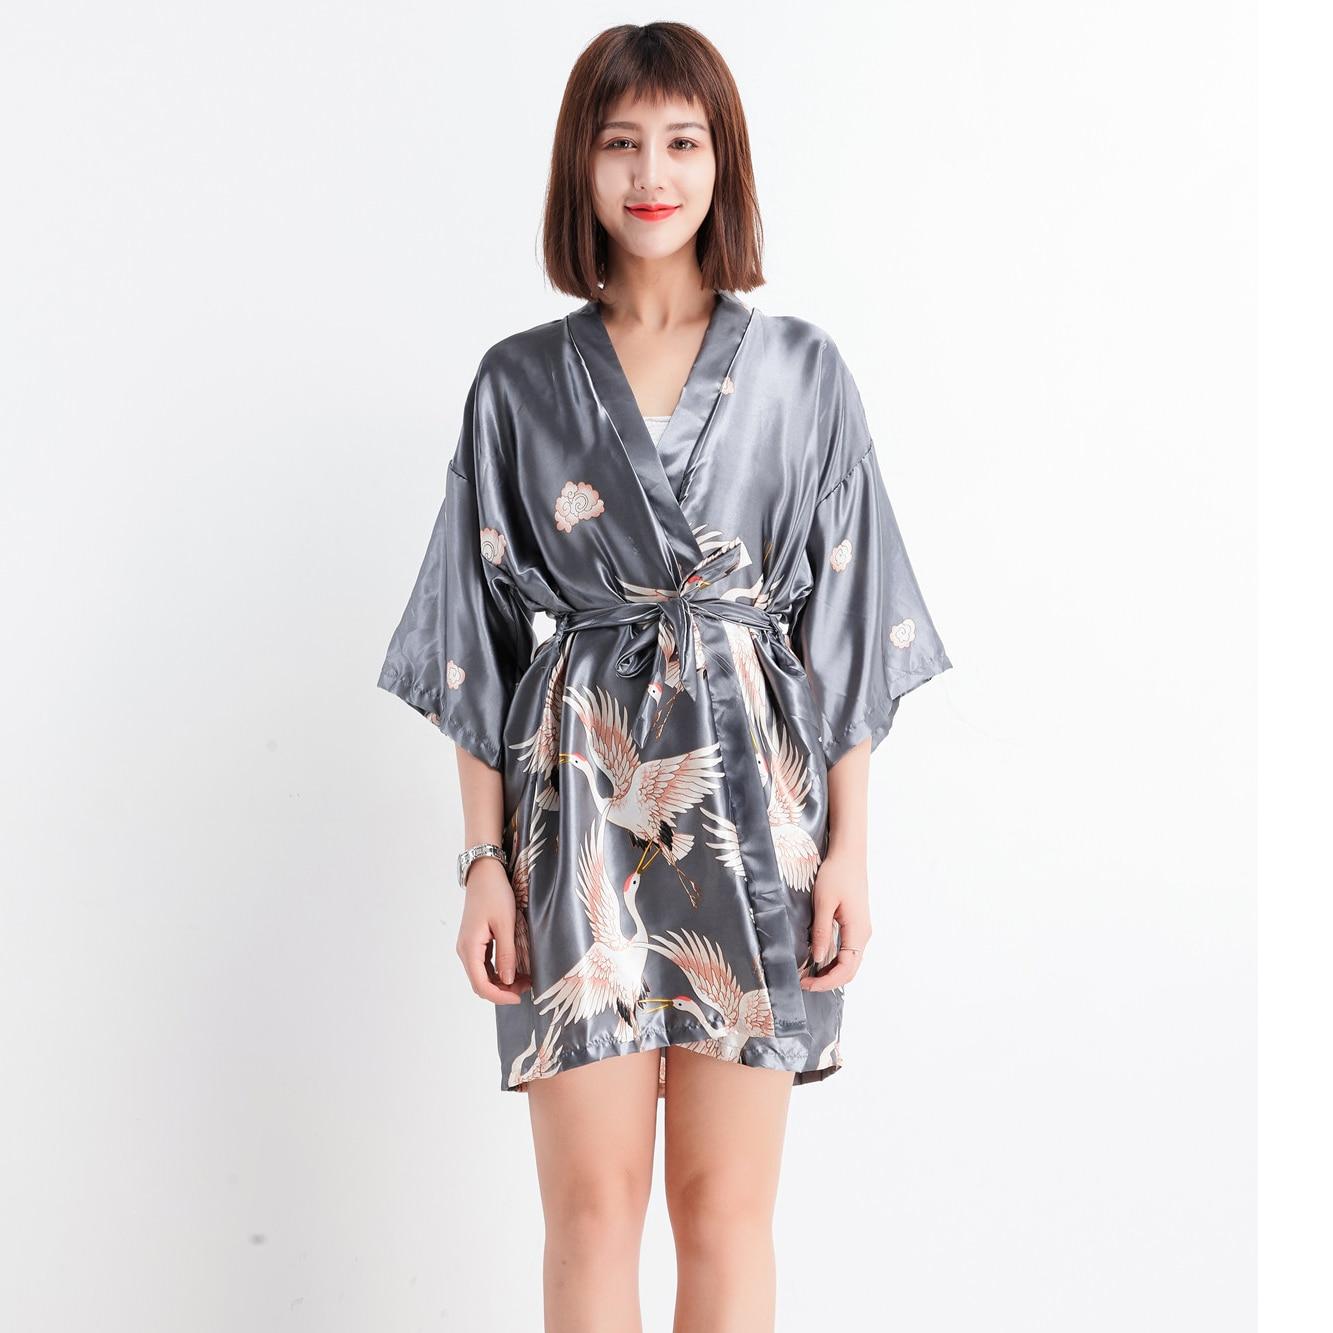 ec8ab2eb5abb 2018-Summer-Women-Gray-Sleepwear-Elegant-Rayon-Nightgown-Wedding-Robe- Nightwear-Lady-Spa-Nightdress-Lounge-Kimono.jpg